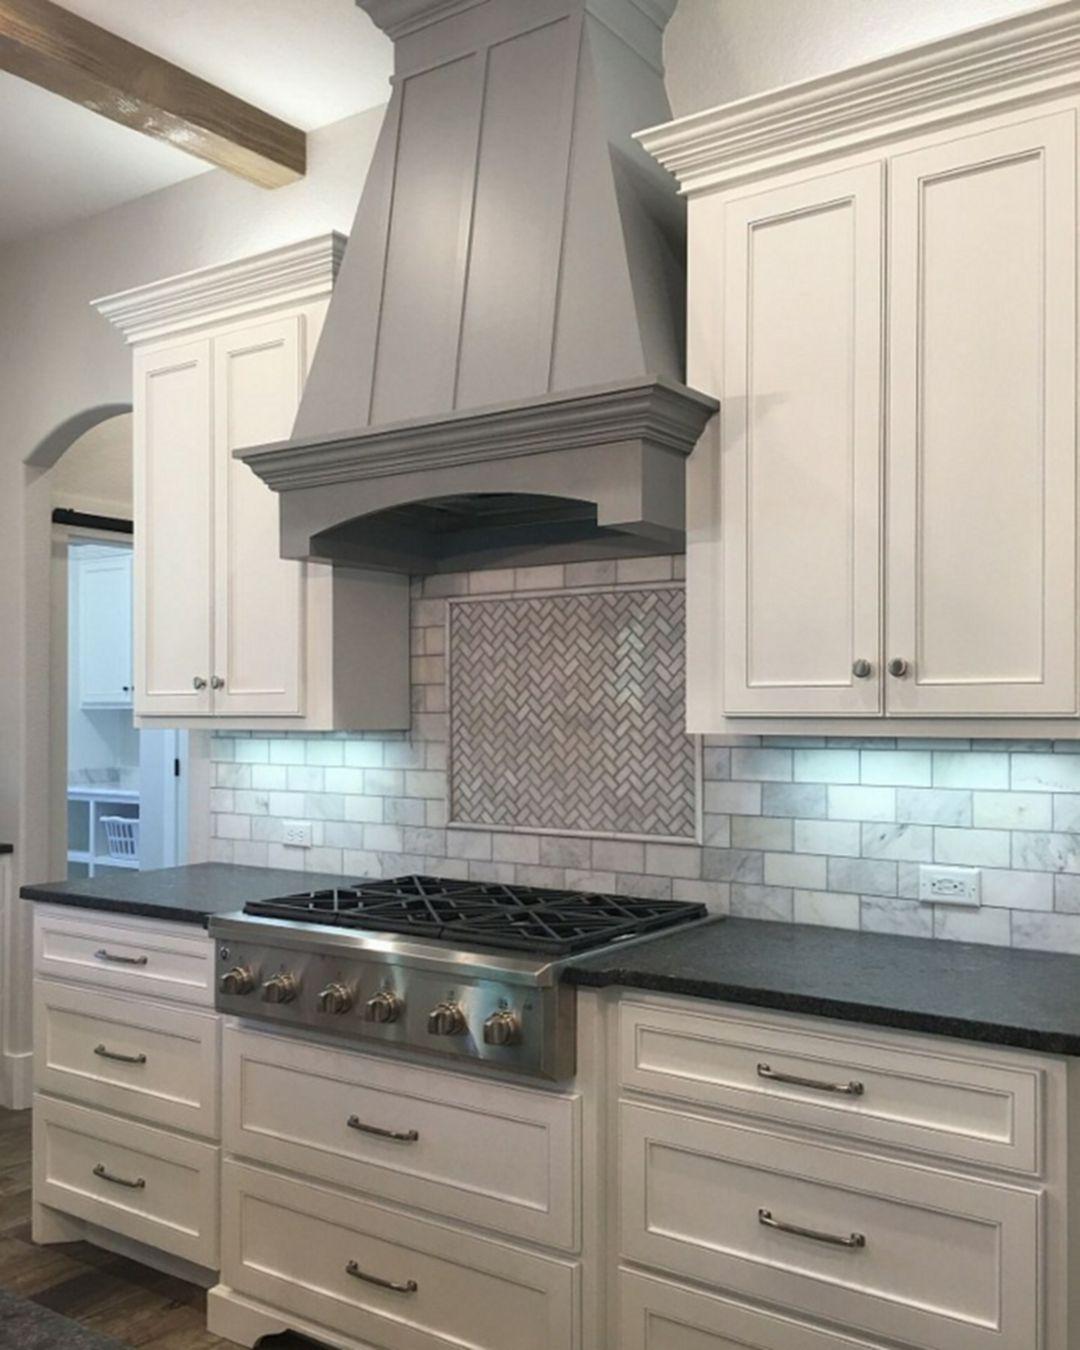 20 Unique Small Kitchen Design Ideas: 20 Best & Stunning Farmhouse Kitchen Design Ideas For Your